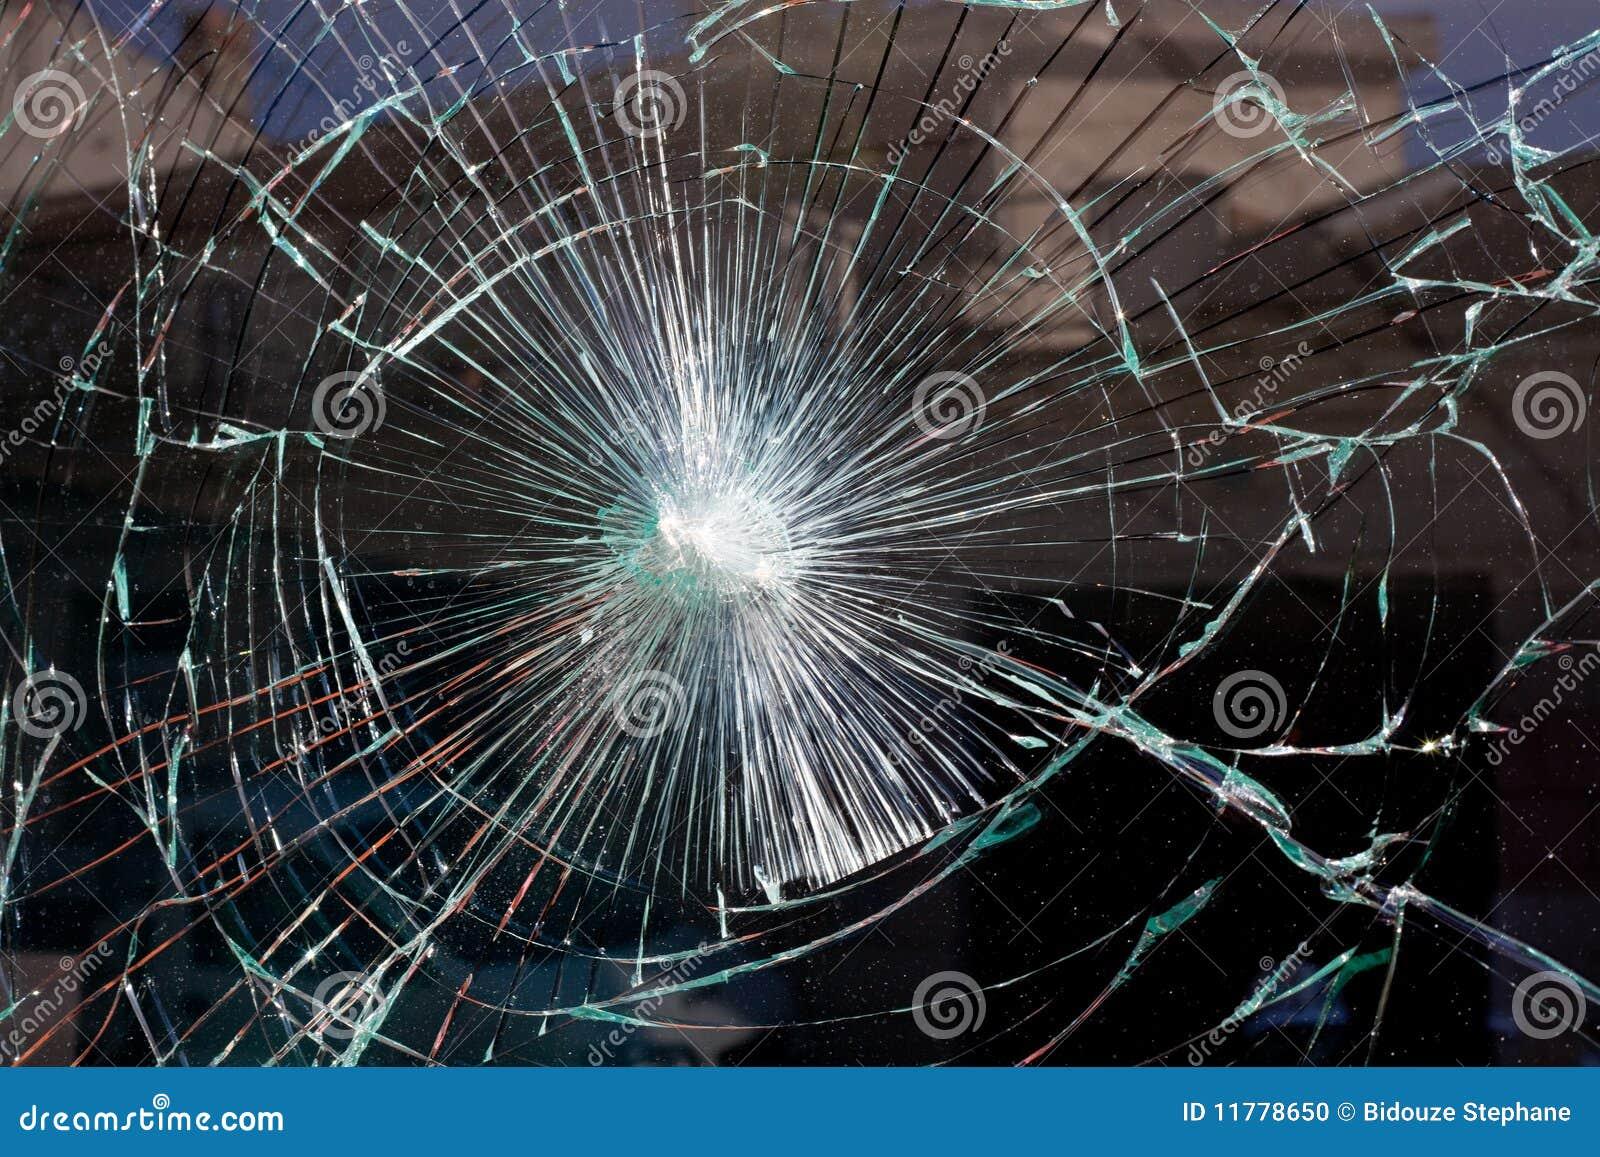 Broken glass web